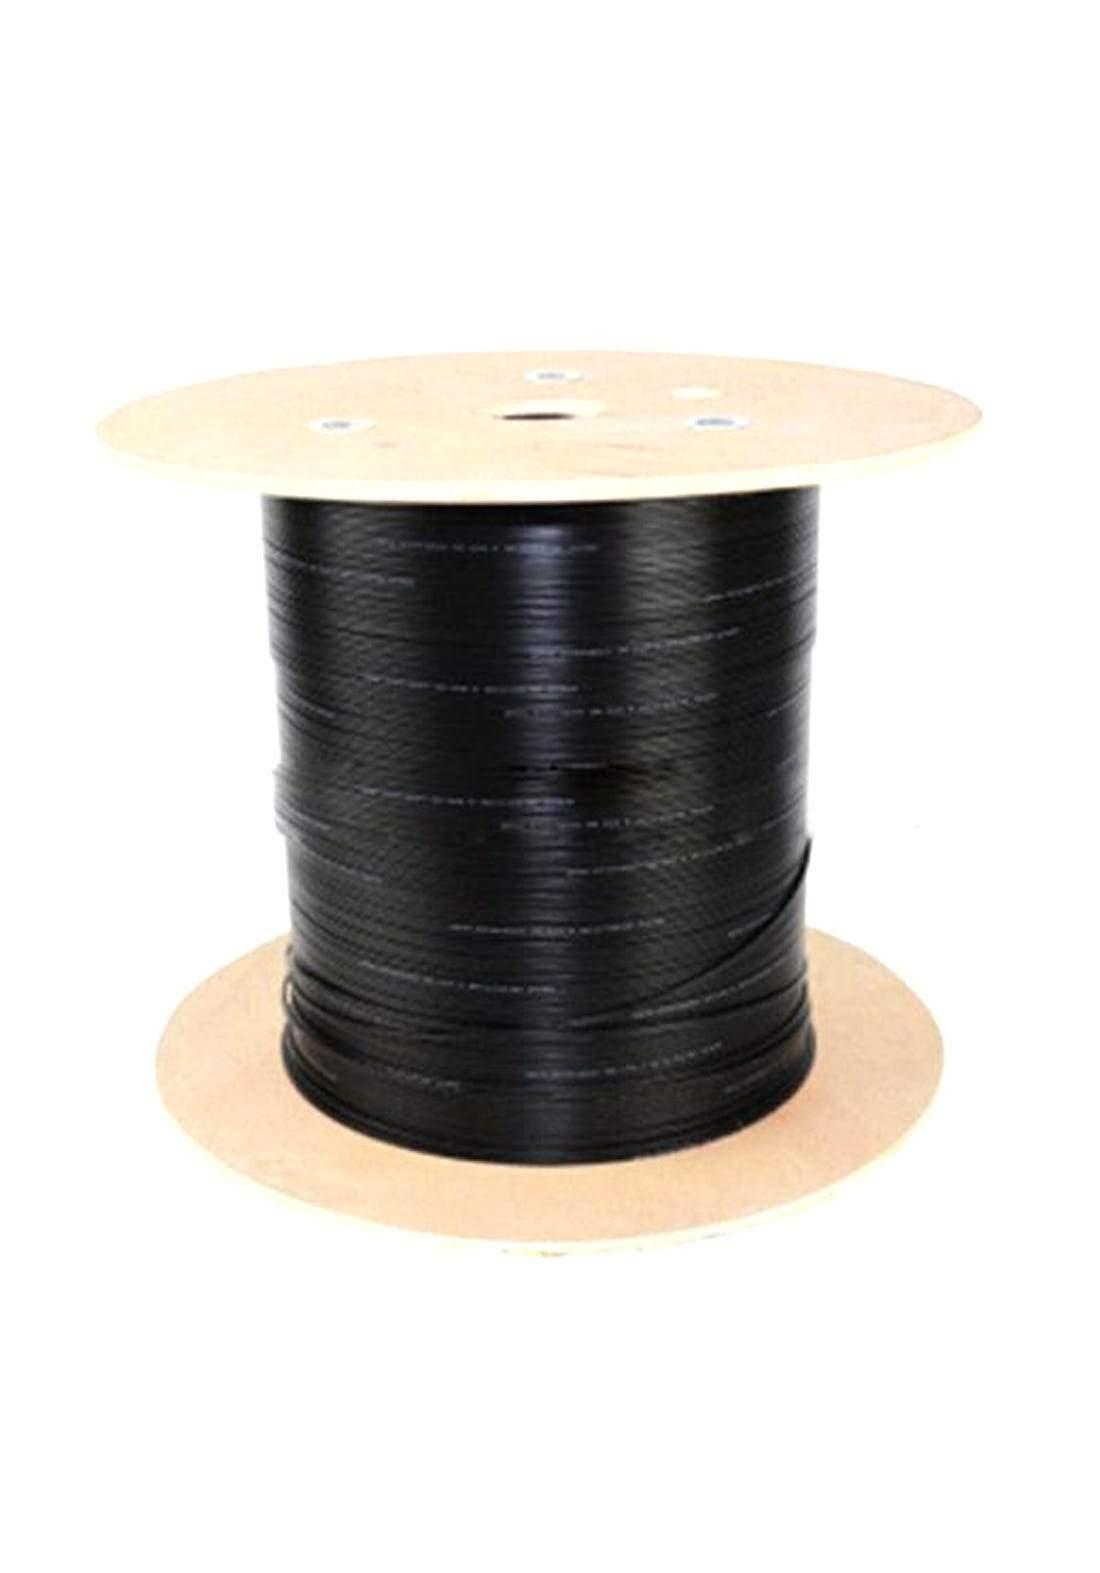 STS (GYXTY-4B1) 4 Core Fiber Optic Cable - Black كابل ضوئي